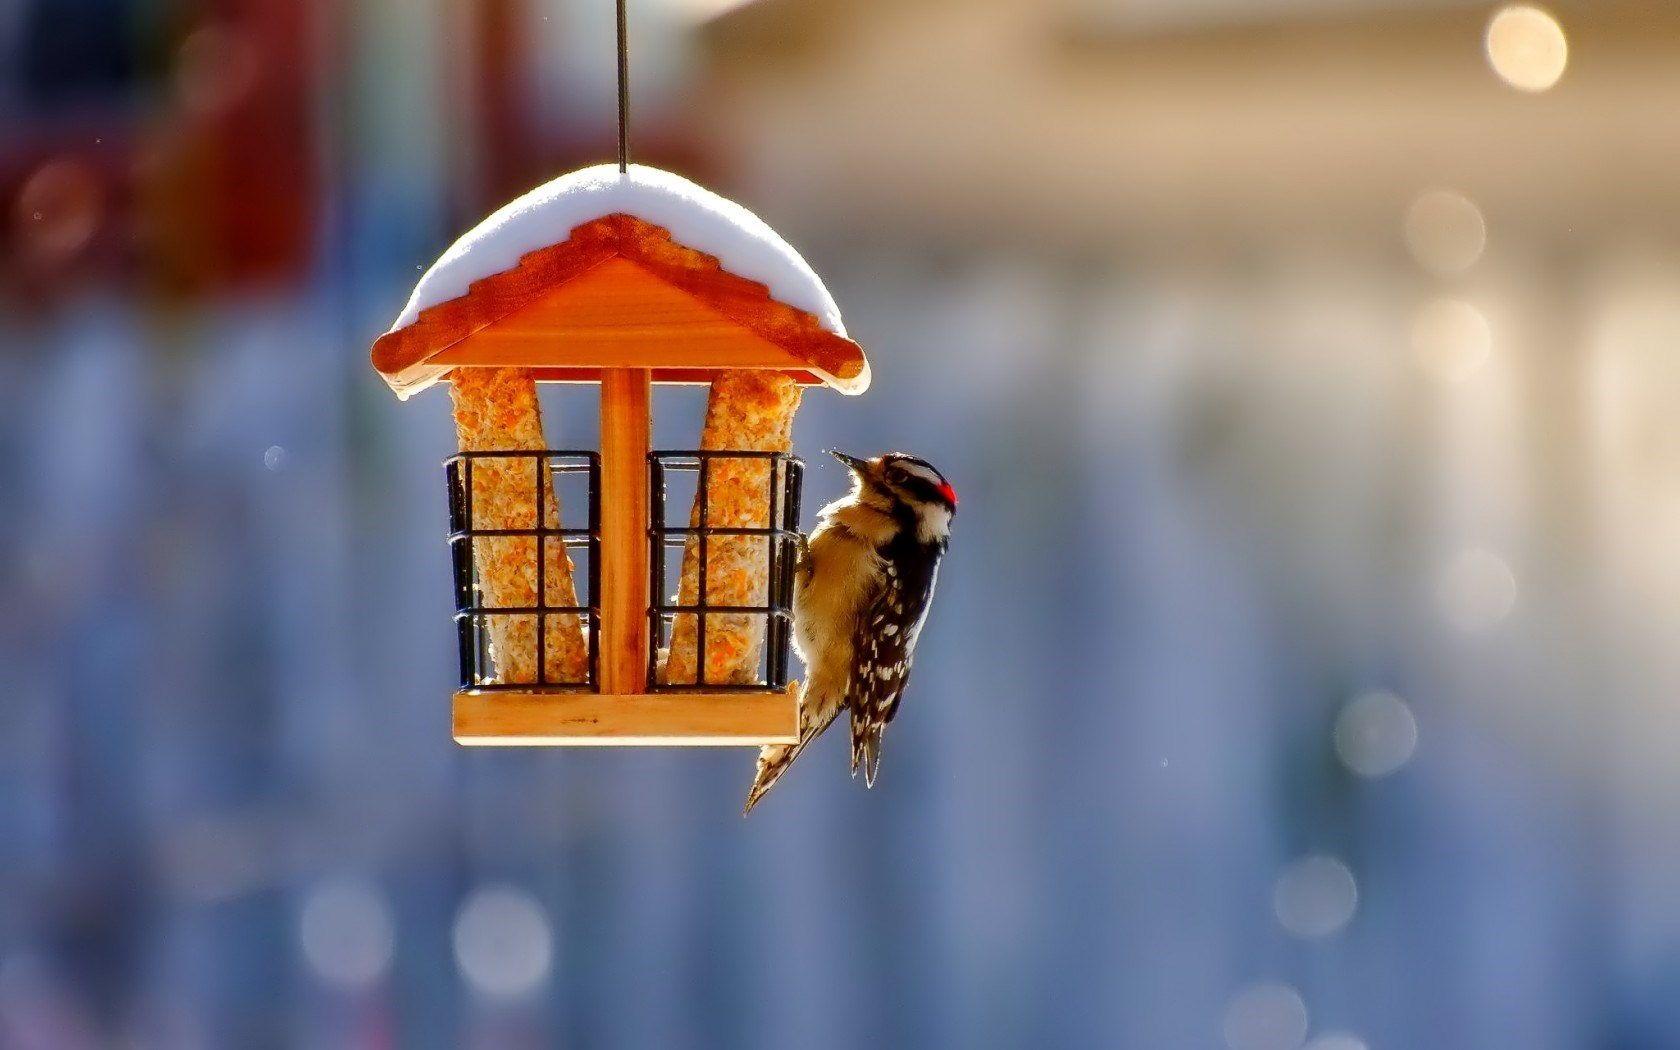 Birdhouse Bird Winter Snow Nature By Tina Haxhia On 500px Birds Bird Wallpaper Birds Wallpaper Hd